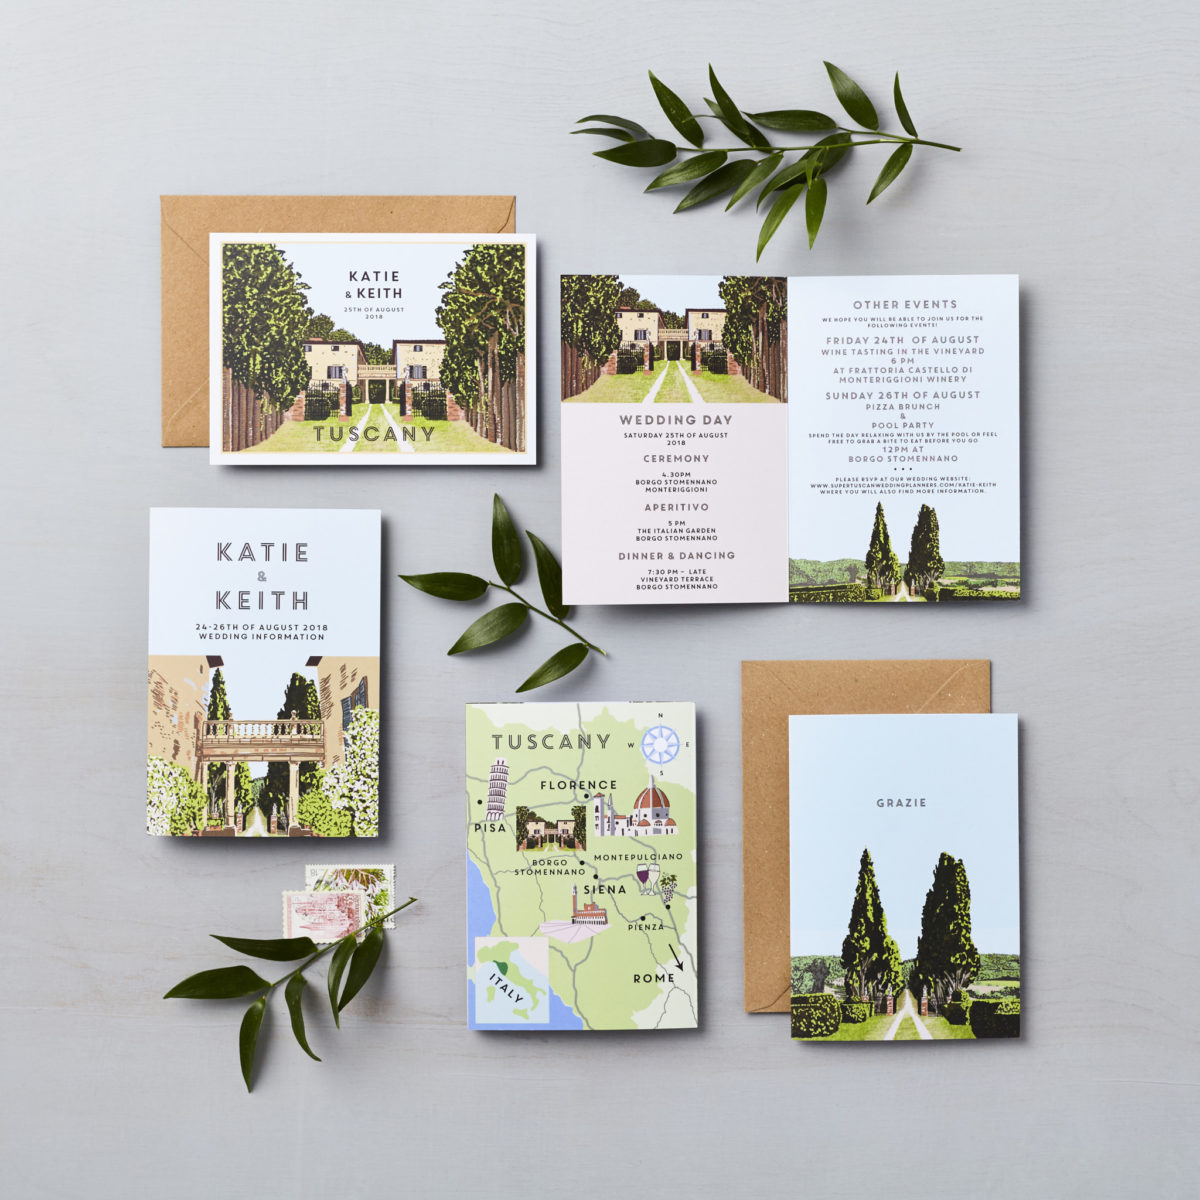 LSID bespoke wedding invitation Katie and Keith Tuscany LucysaysIdo